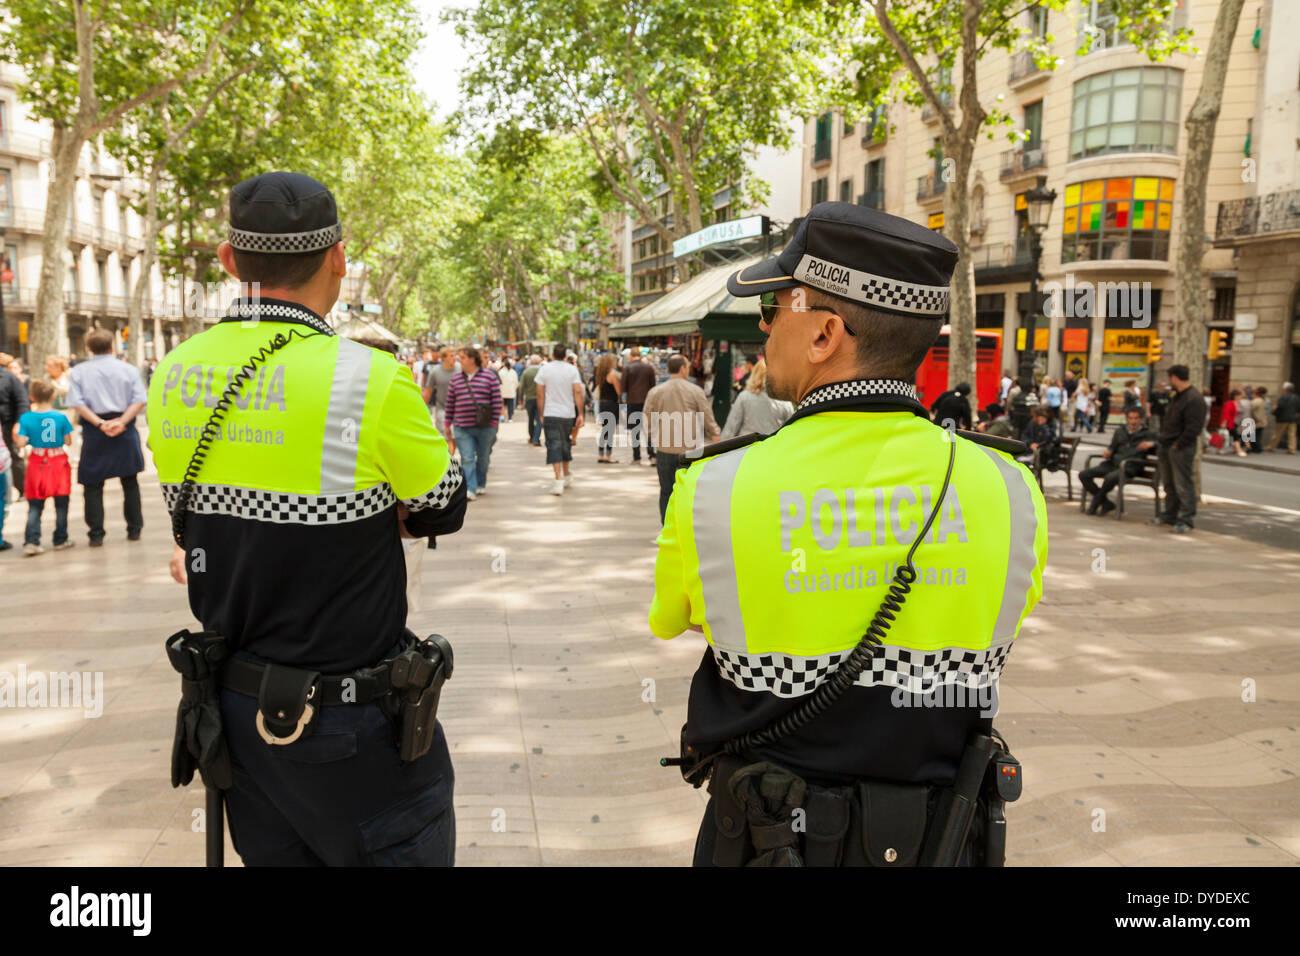 Two Guardia Urbana Policemen policing the La Rambla in Barcelona. - Stock Image